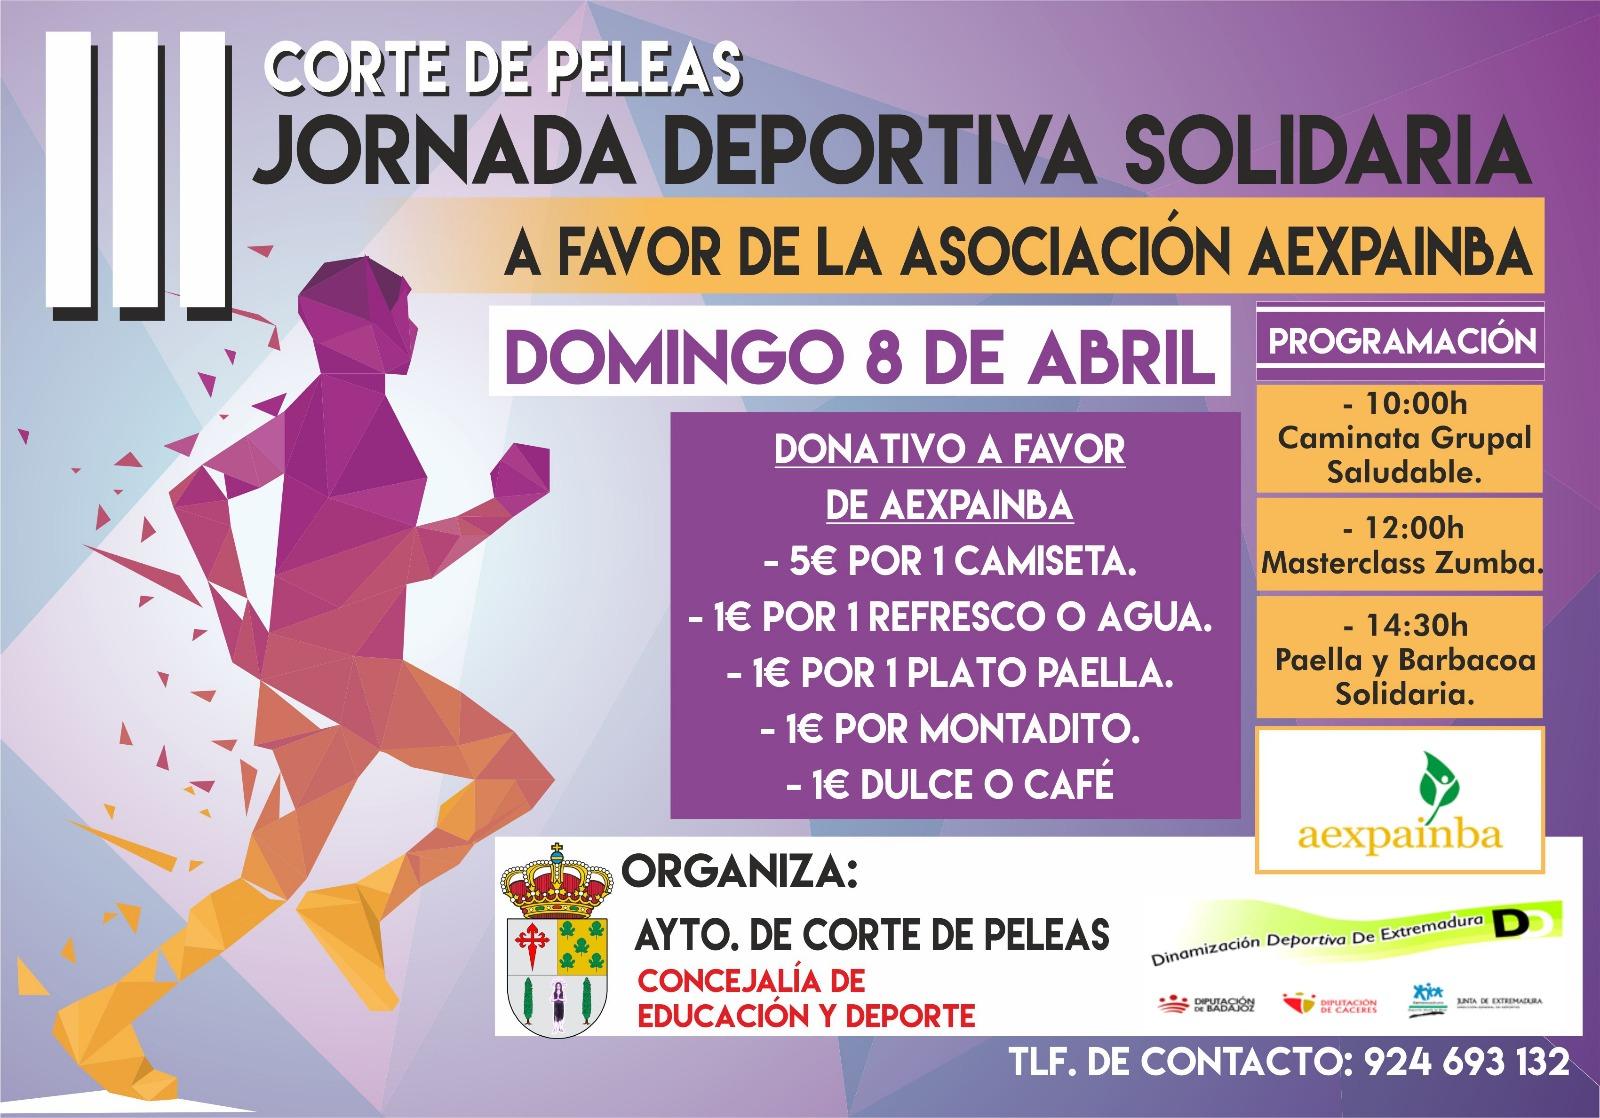 Jornada Deportiva Solidaria a favor de AEXPAINBA